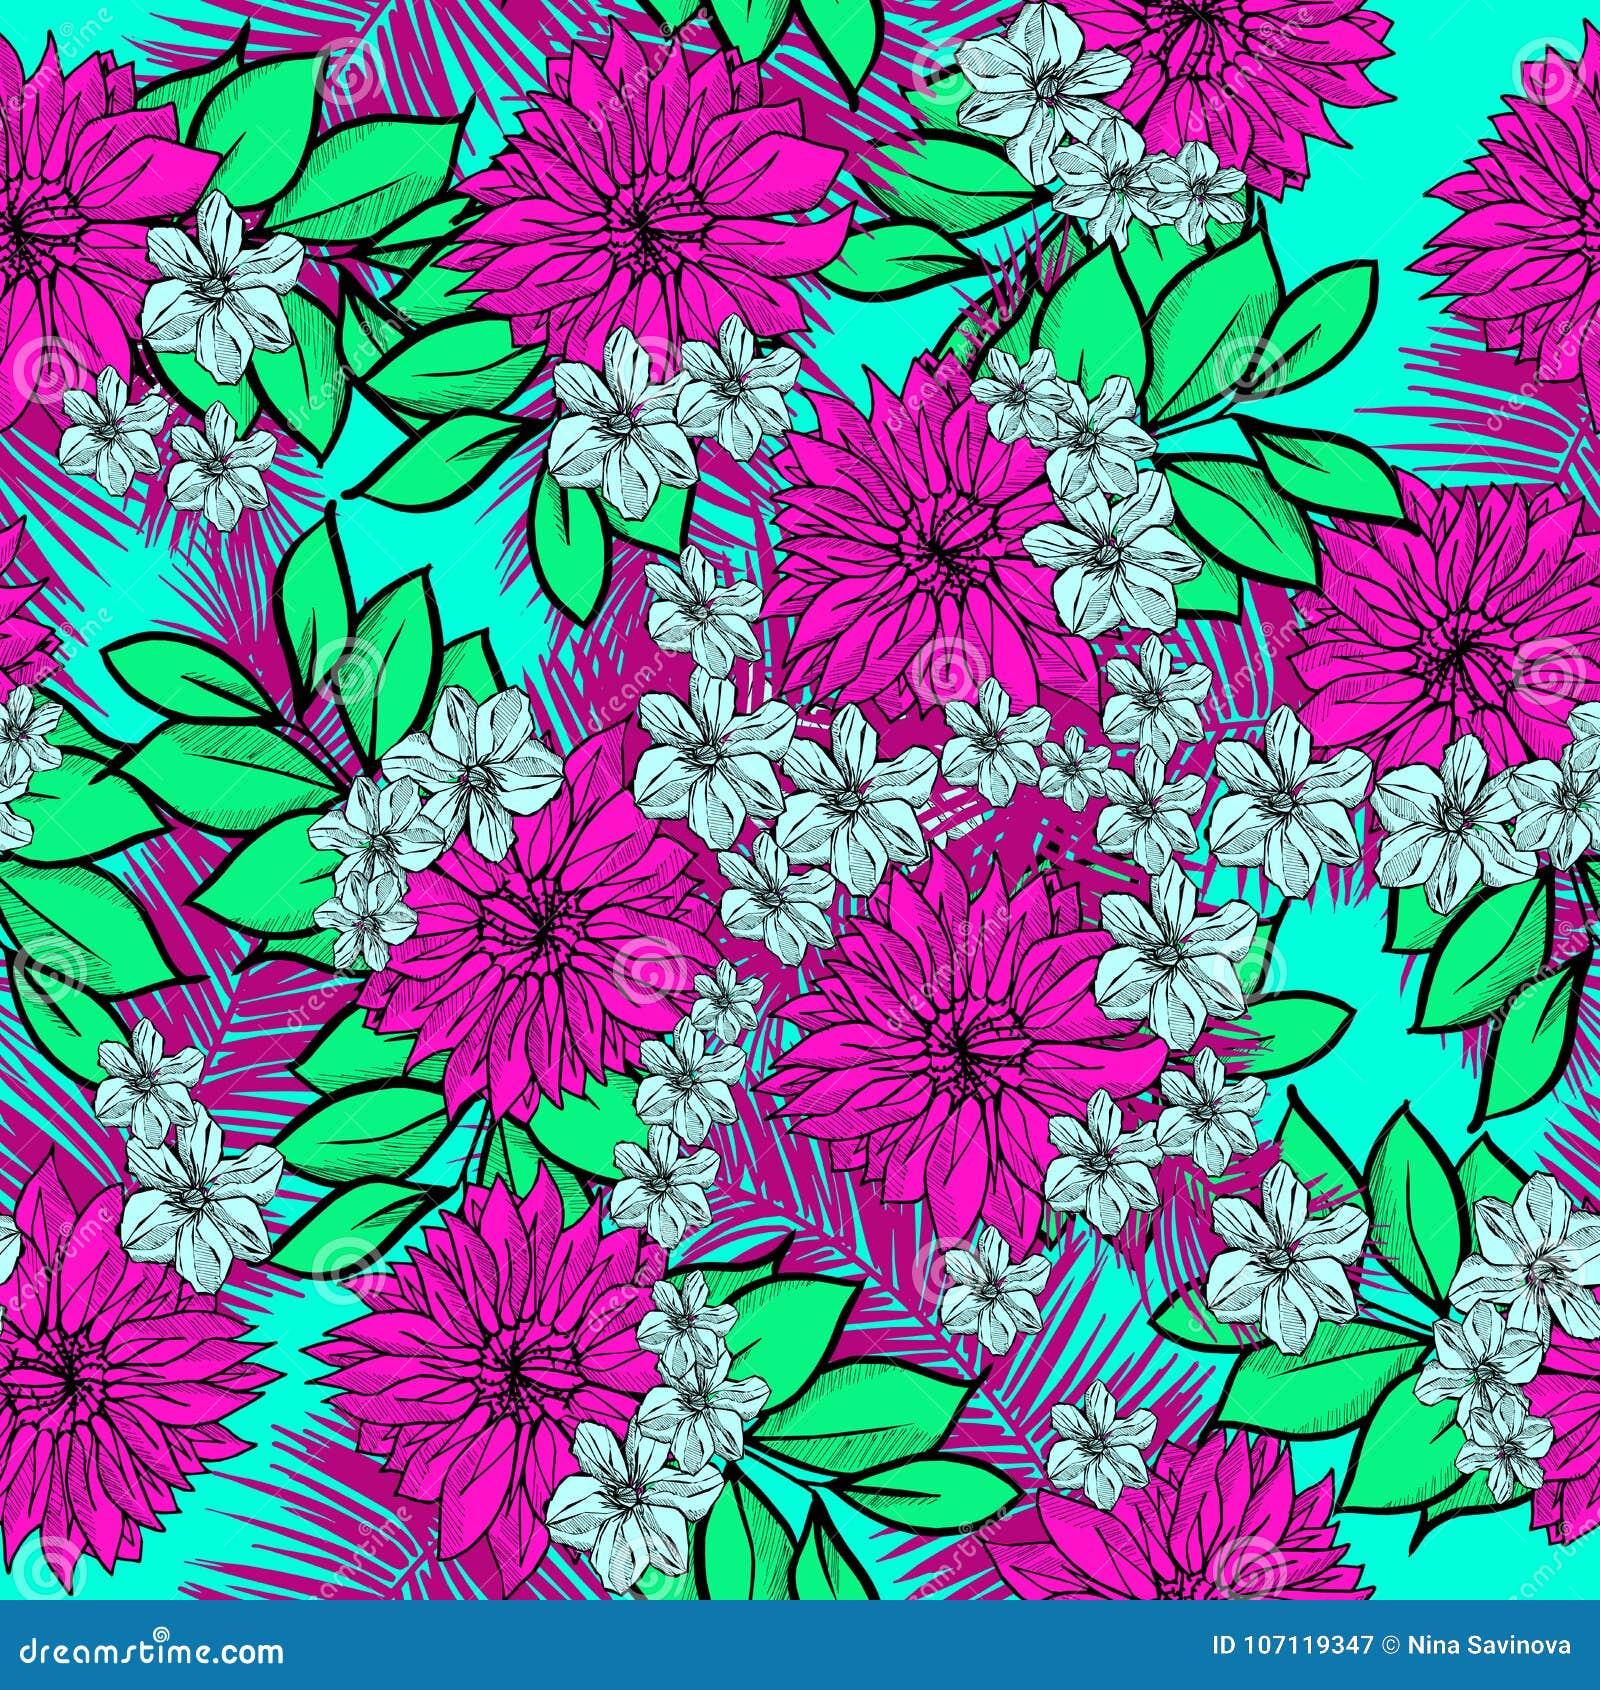 Beautiful And Colorful Hand Drawn Hawaiian Tropical Flowers Repeated